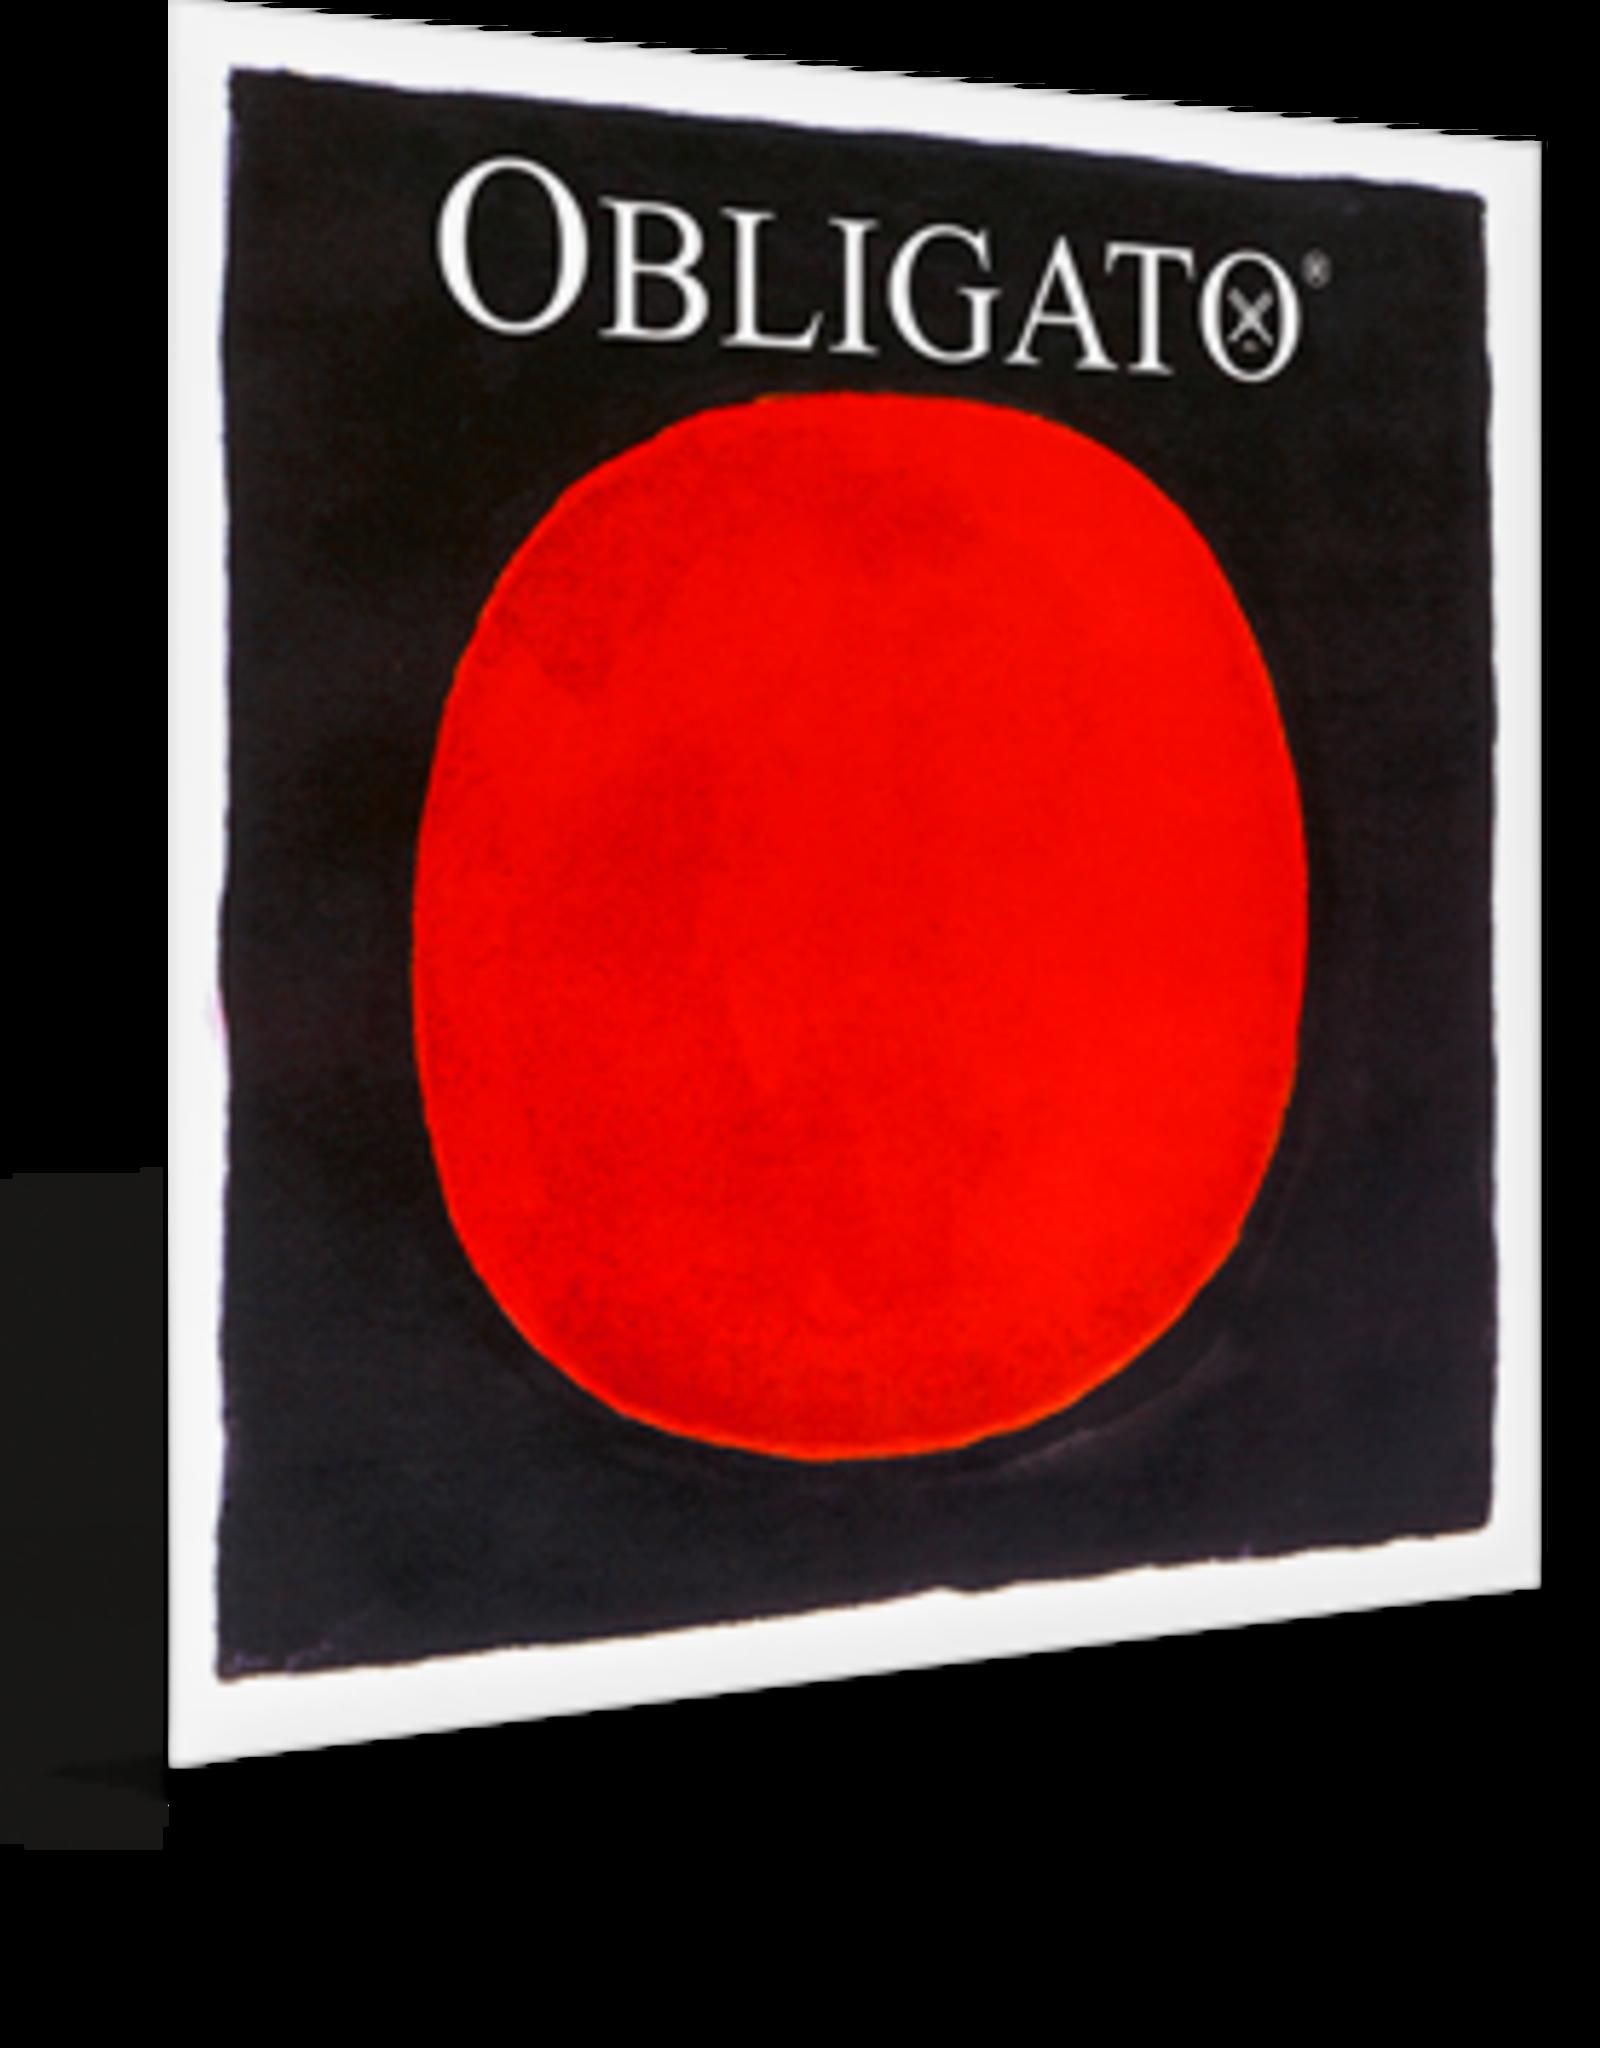 PIRASTRO Obligato vioolsnaar, sol (g-4),  4/4, synthetisch, zilver